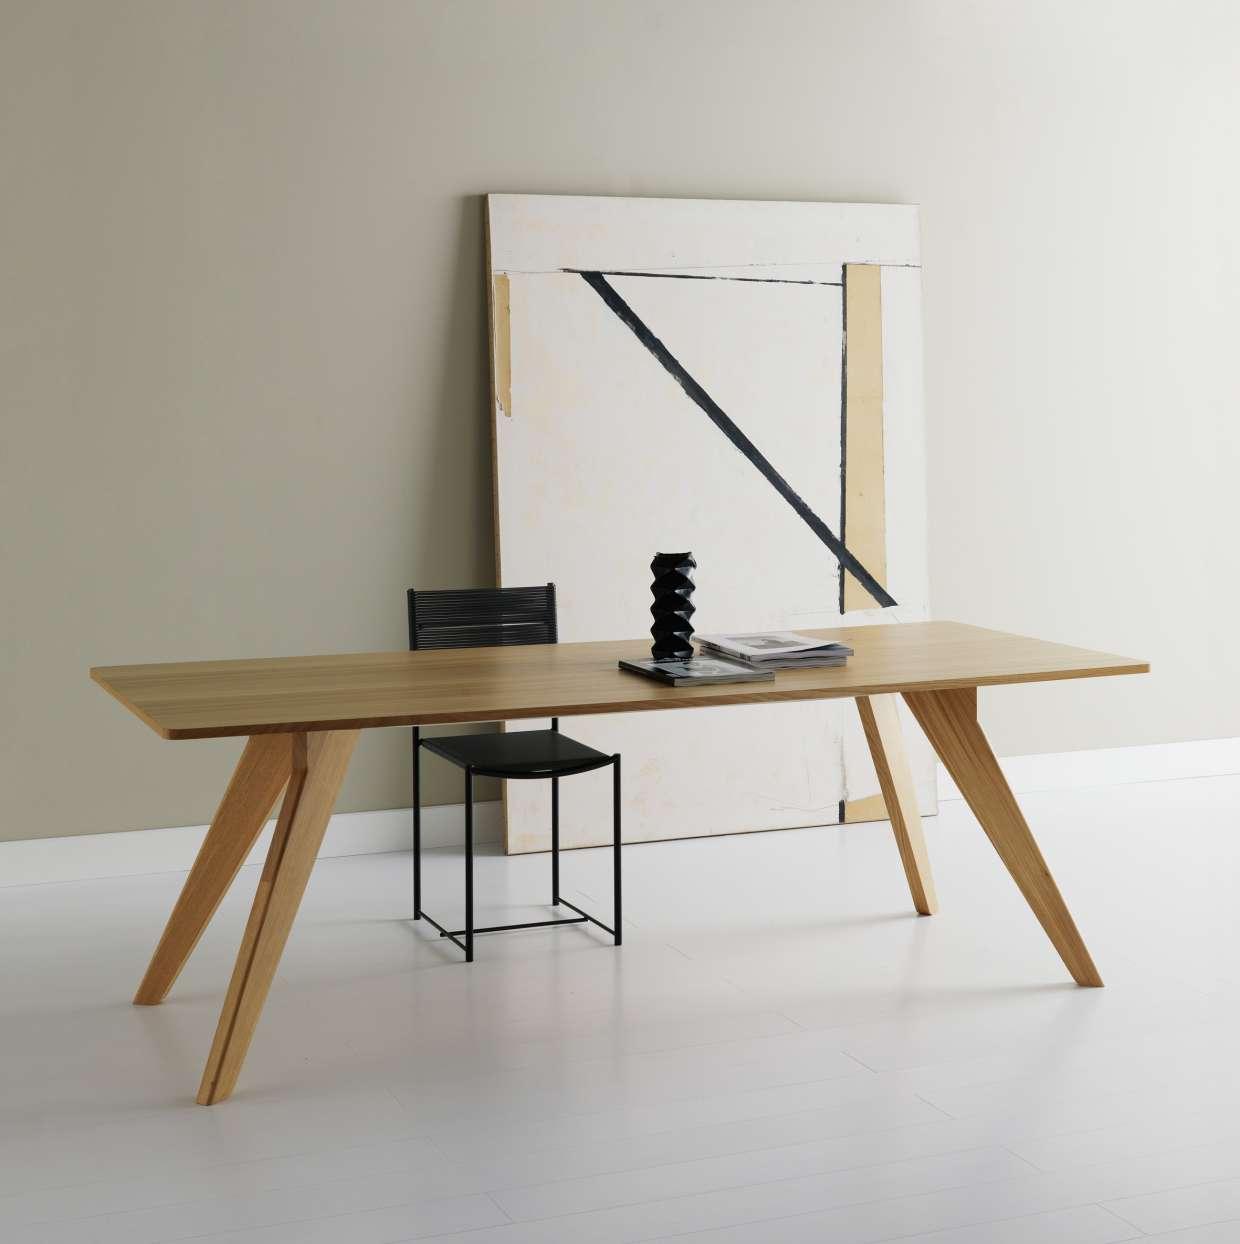 soldes meubles design mobilier et luminaires del mont porrentruy moutier jura suisse. Black Bedroom Furniture Sets. Home Design Ideas